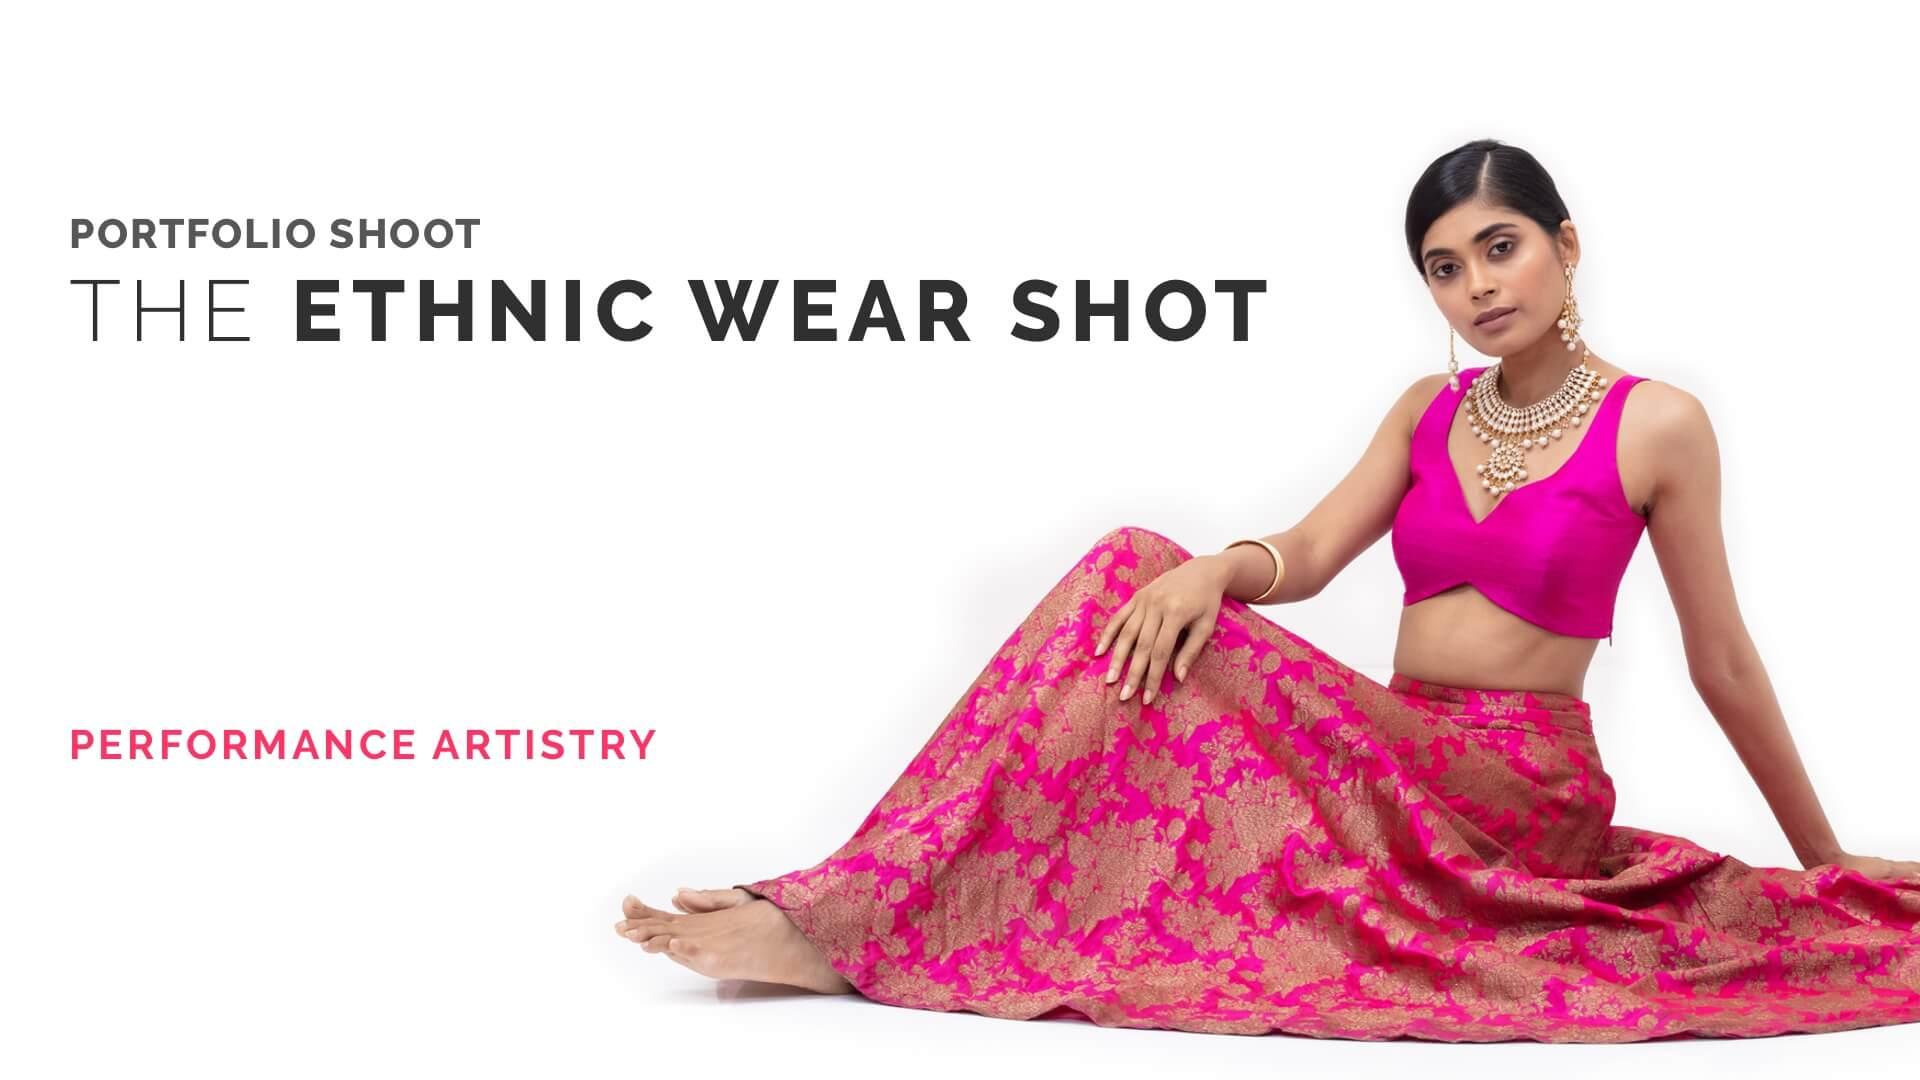 Portfolio Shoot: The Ethnic Wear Shot